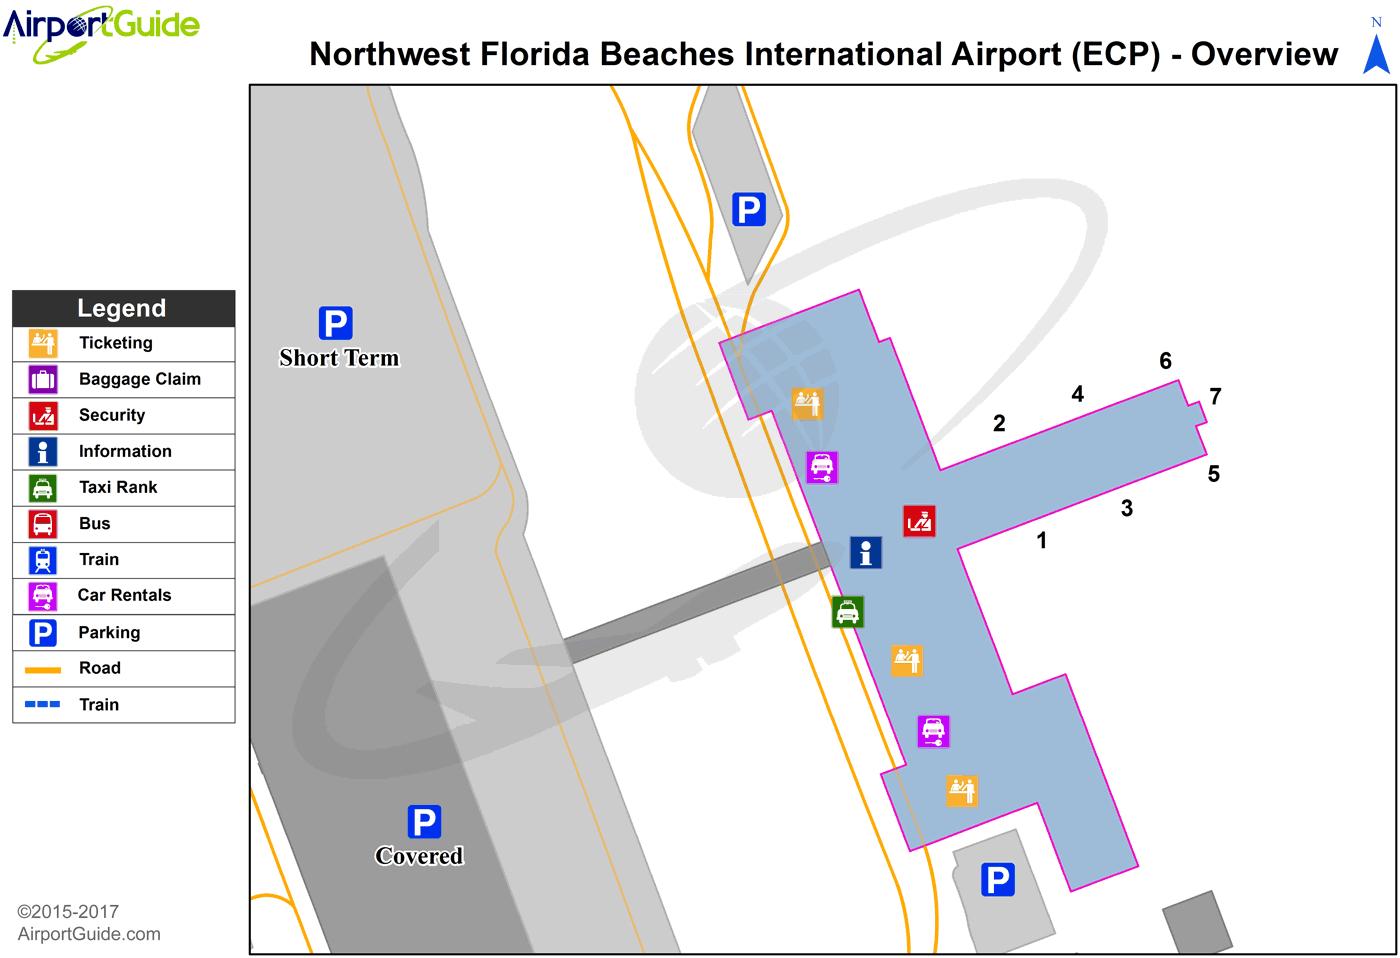 Panama City - Northwest Florida Beaches International (Ecp) Airport - Florida Airports Map